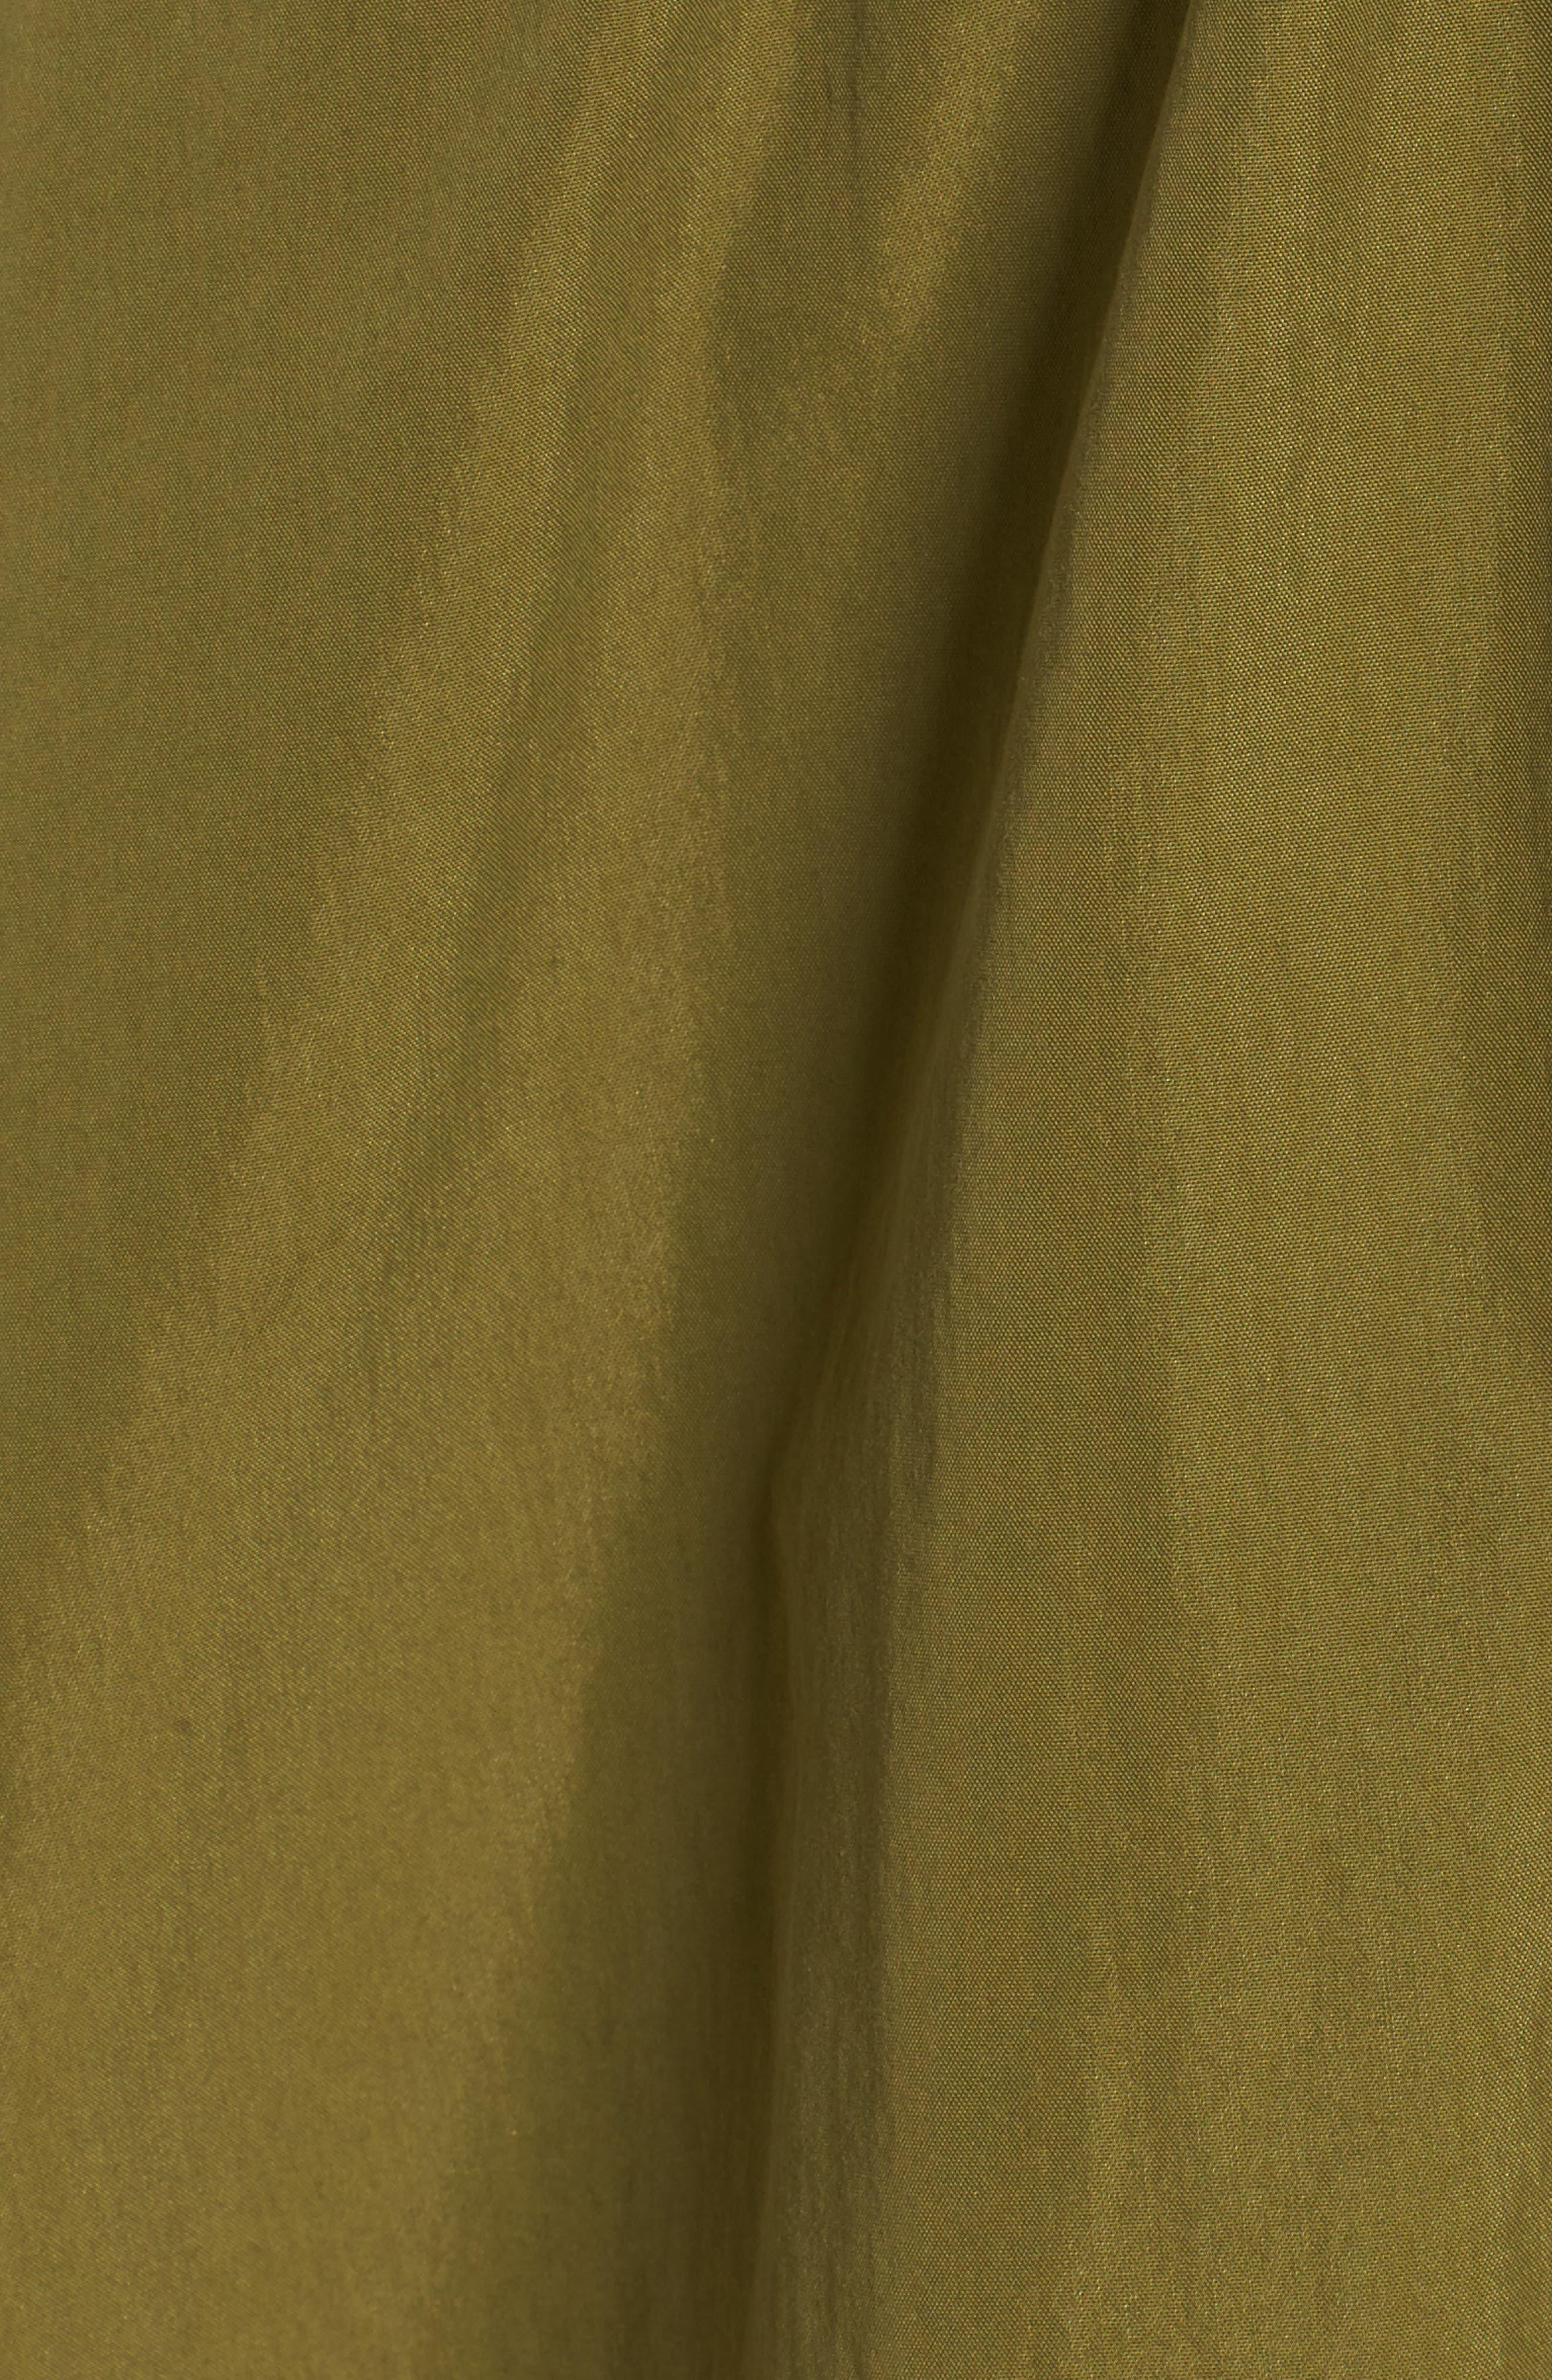 Ruffle Dress,                             Alternate thumbnail 5, color,                             300